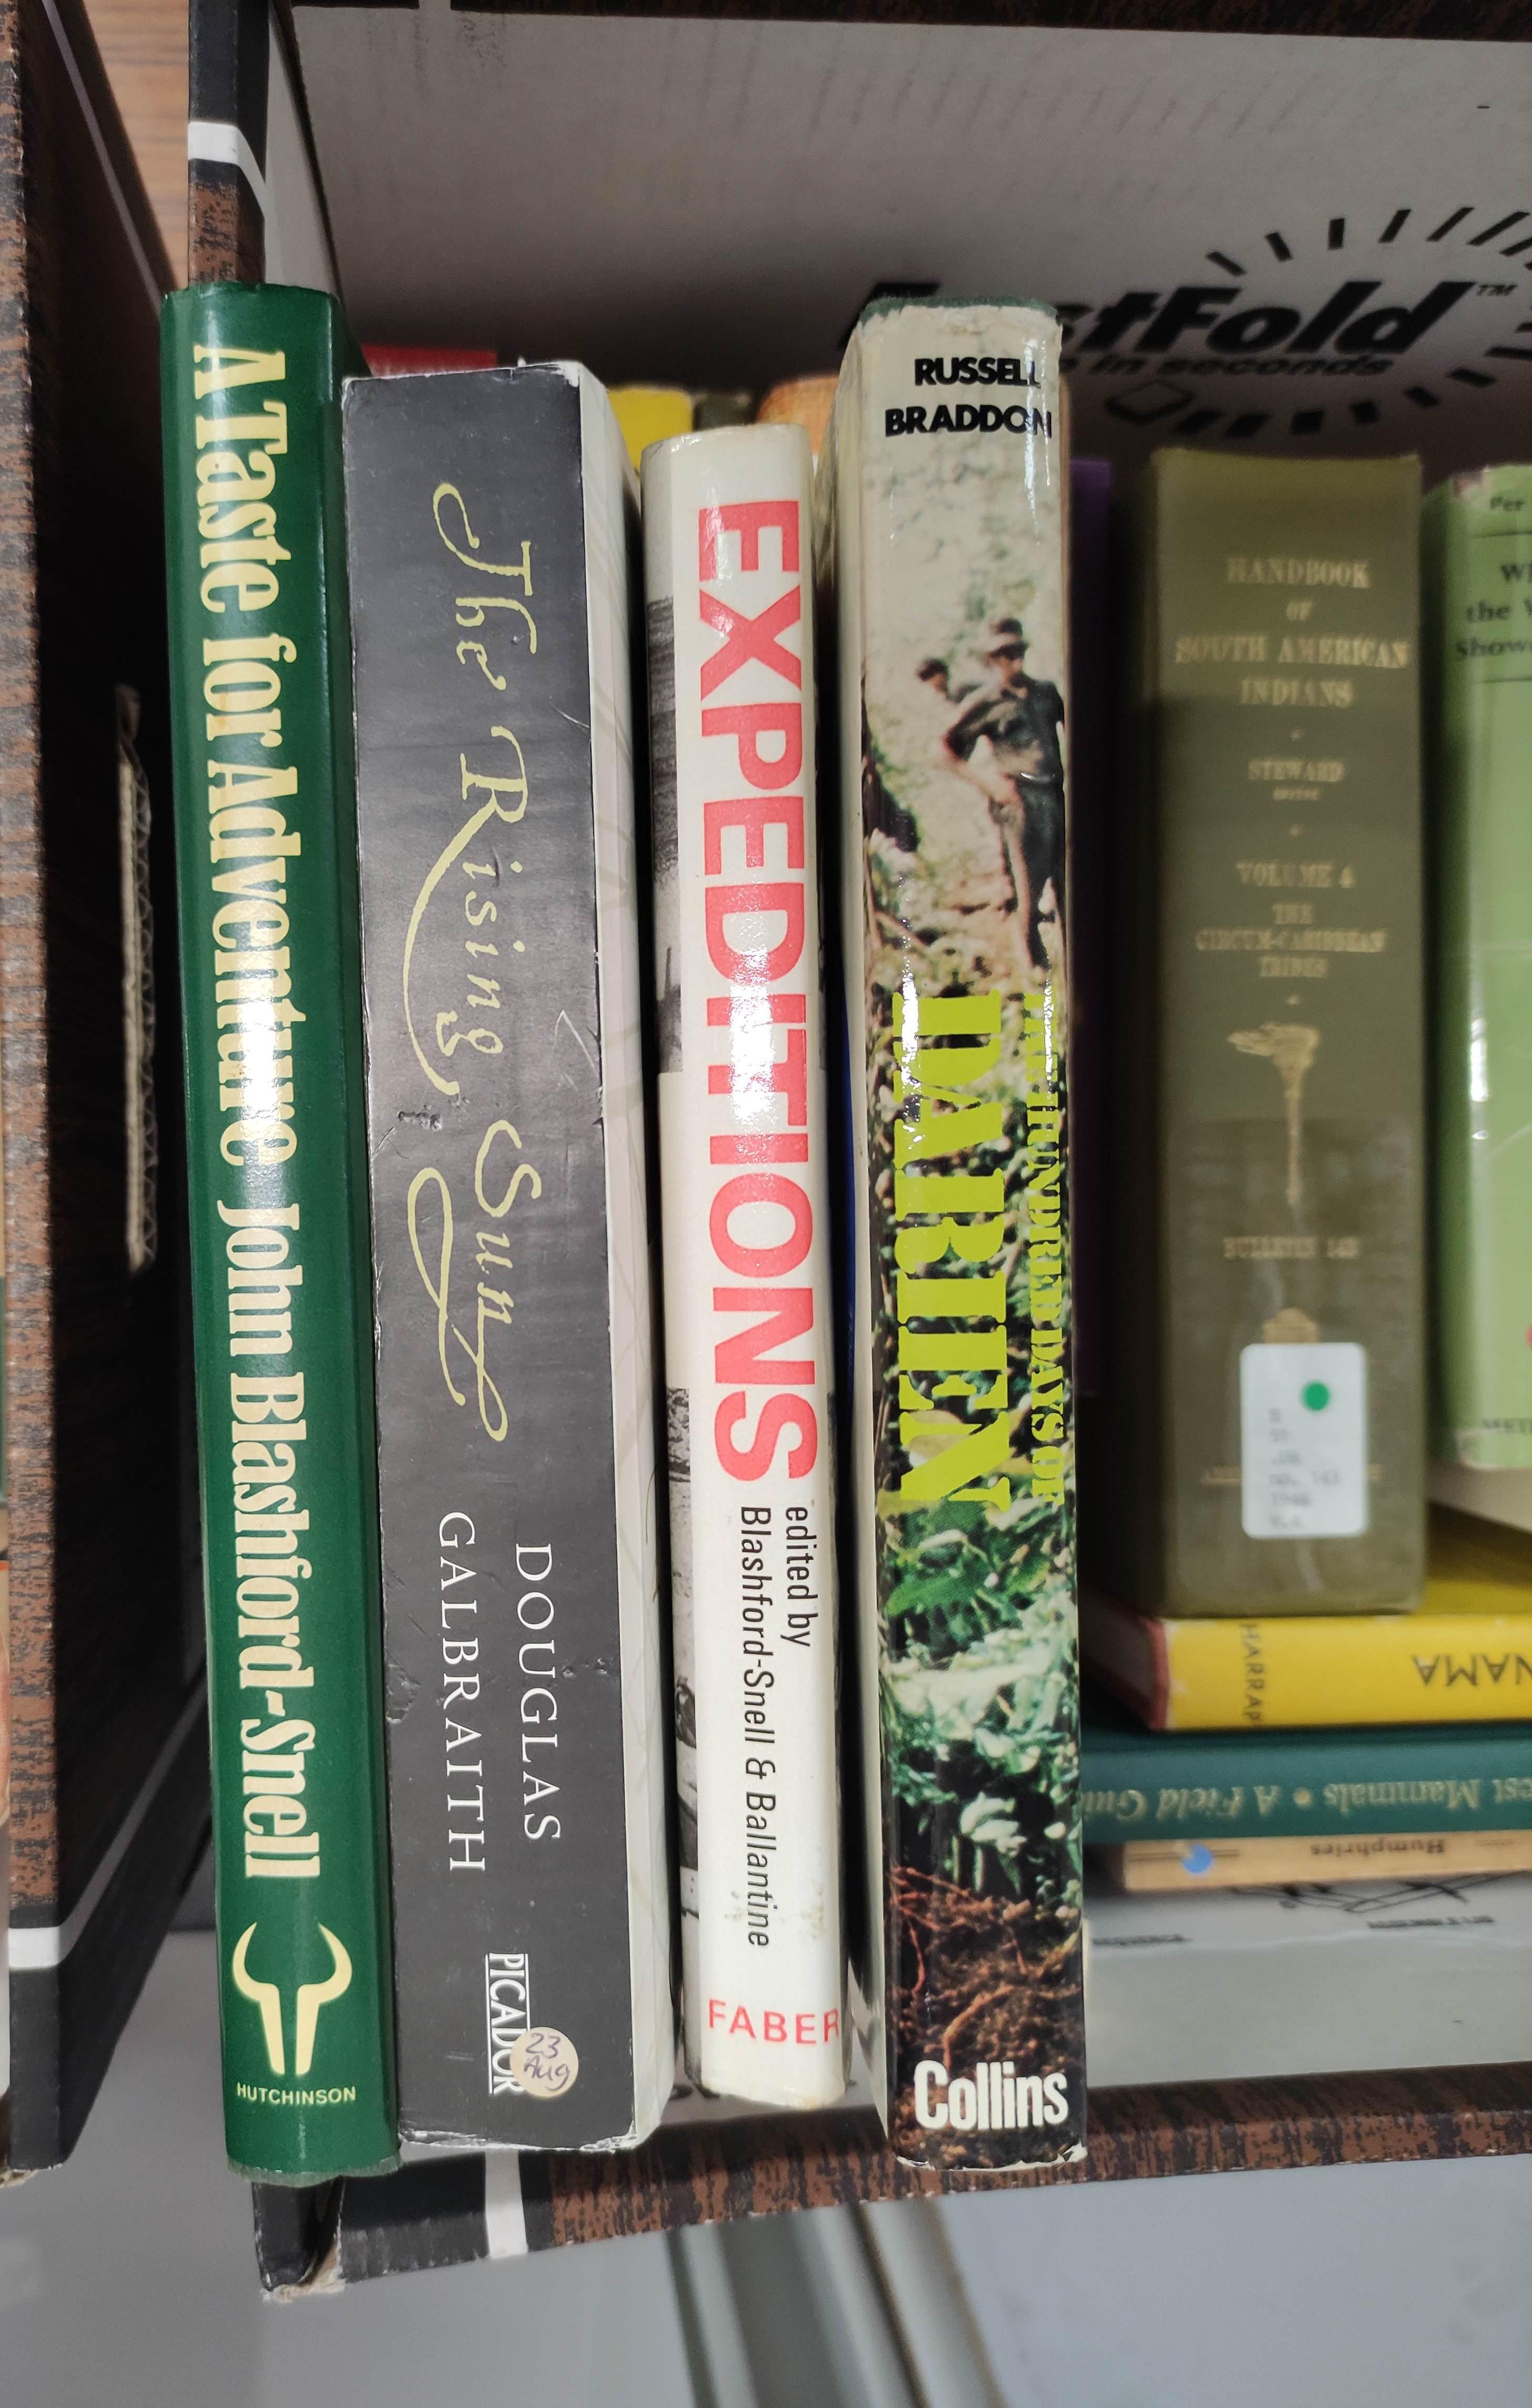 Darien,Panama & Central America.A carton of various vols. - Image 2 of 4